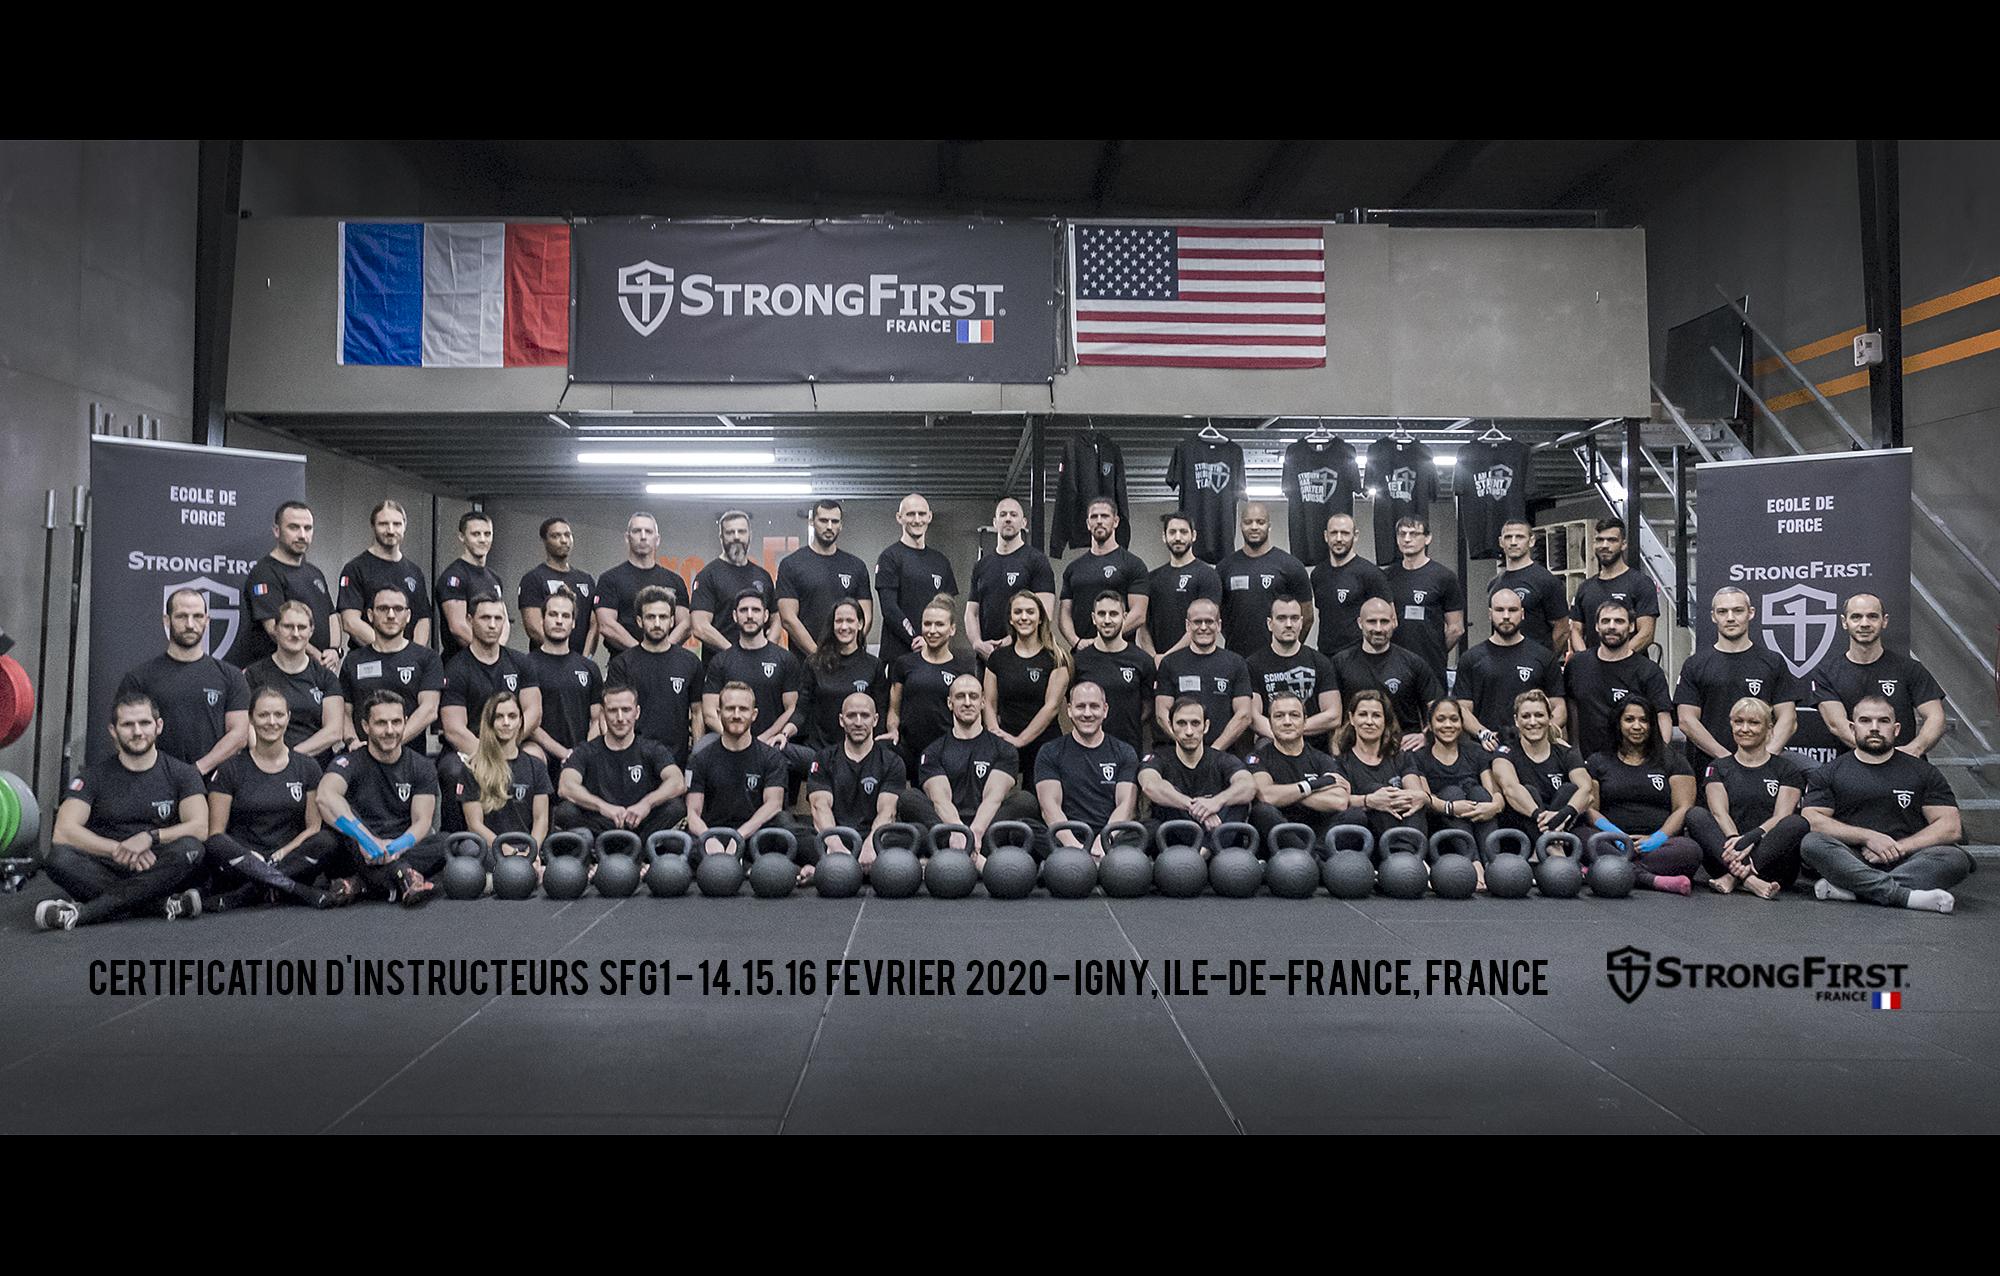 Certification SFG 1 - France, 2020